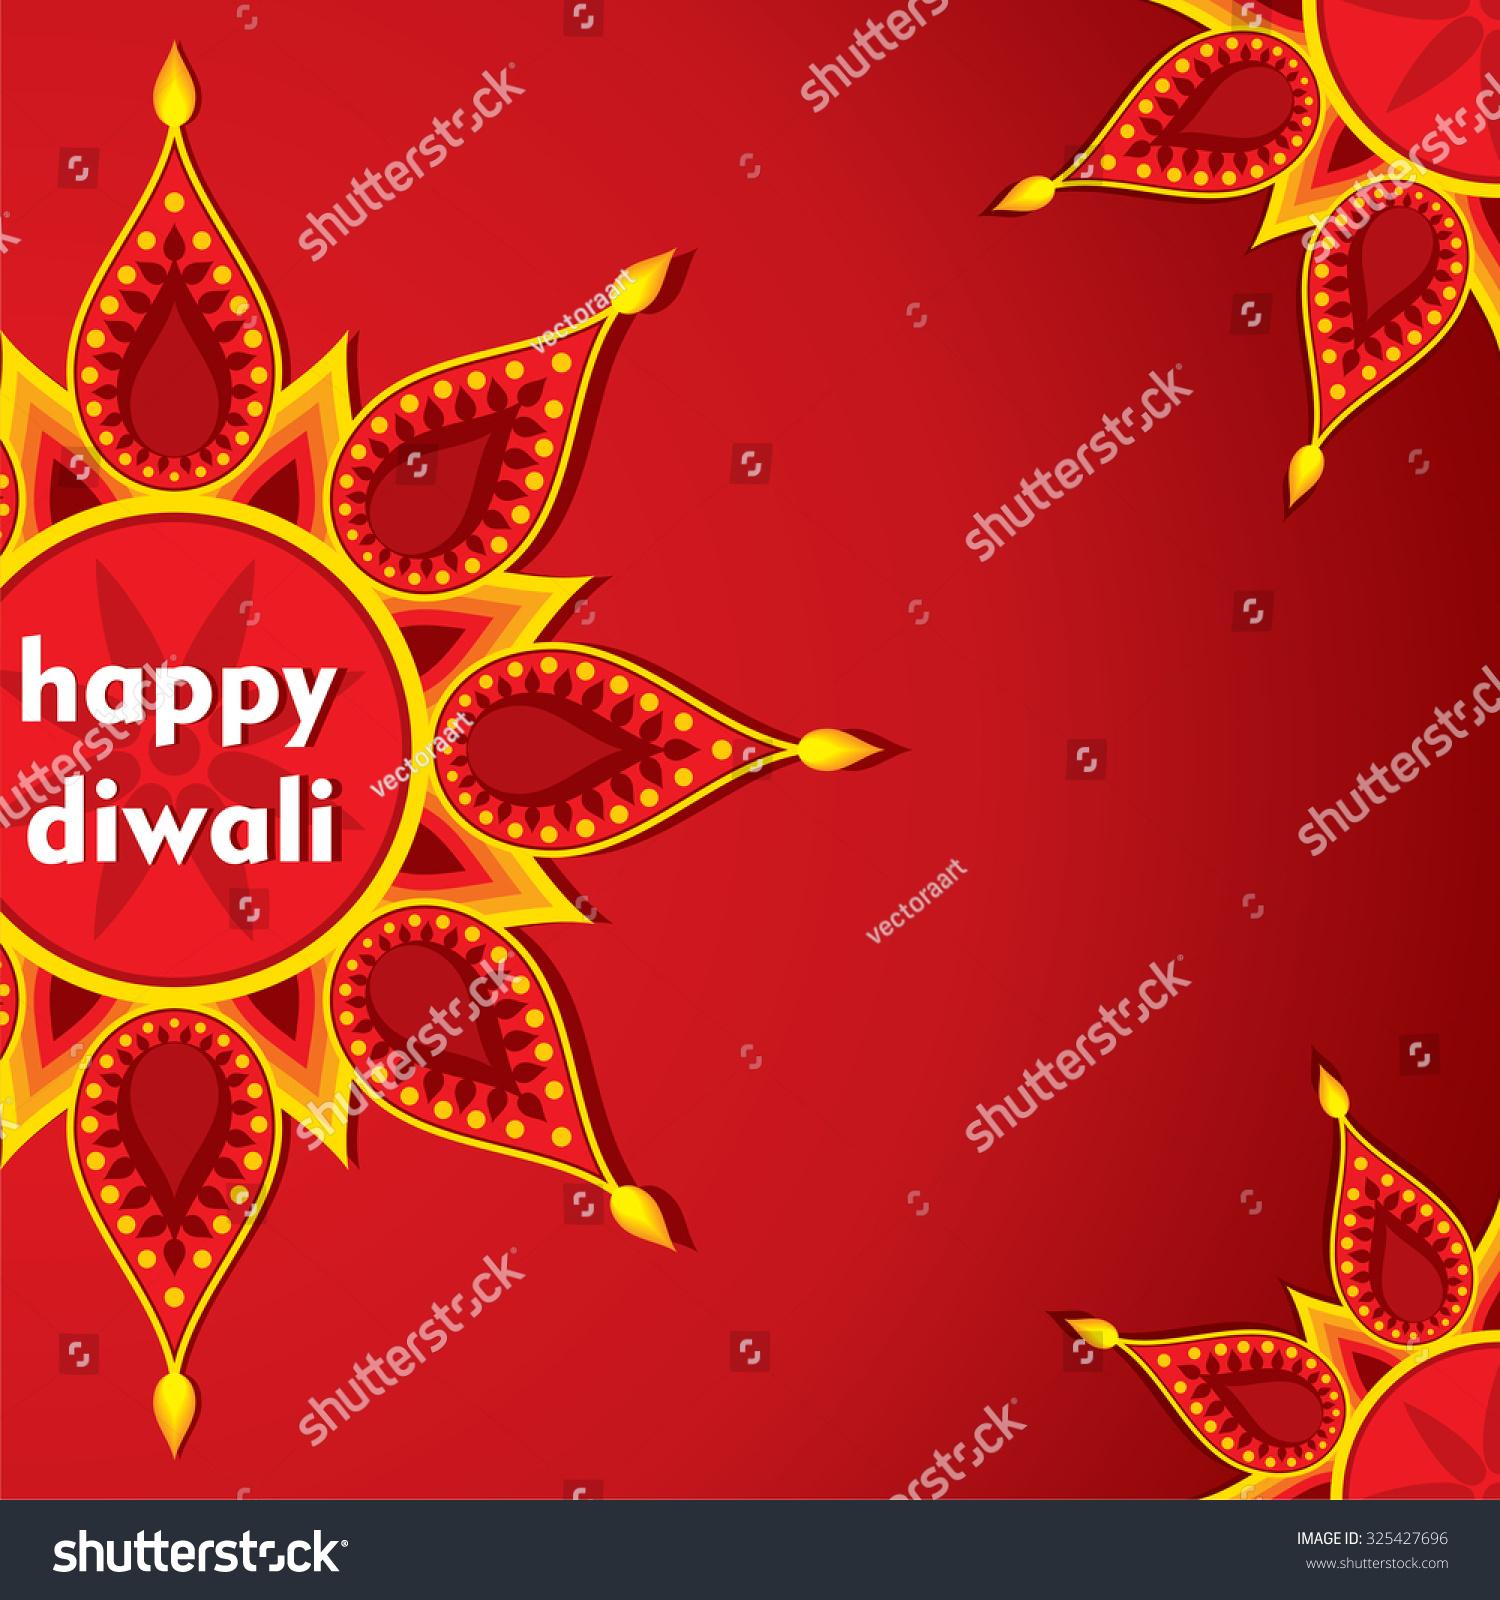 Creative Happy Diwali Greeting Card Design Stock Vector Royalty